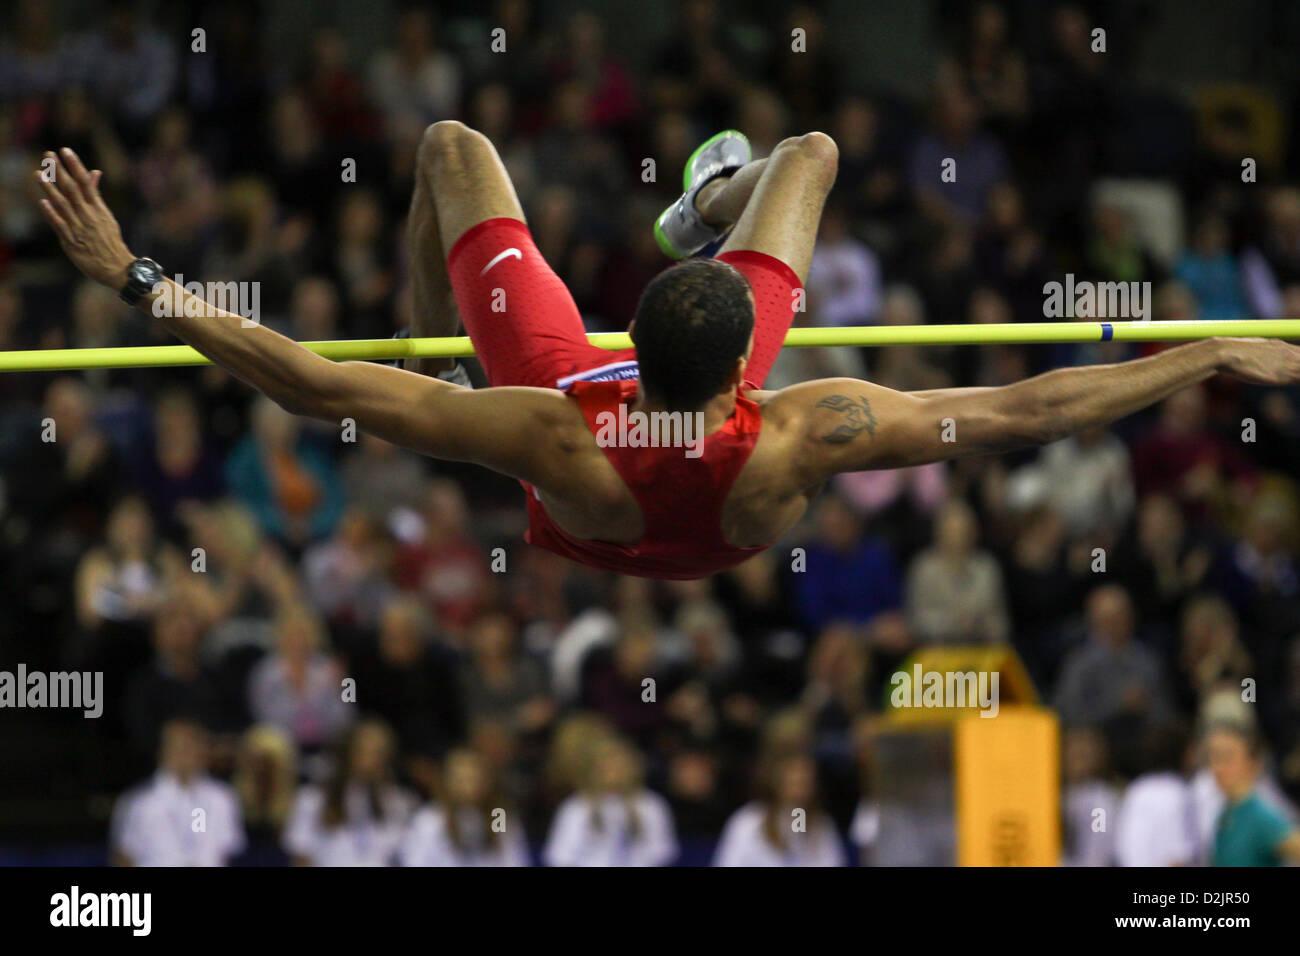 Glasgow, UK. 26th January 2013. Keith Moffat USA Men's high jump third place 26.01.2013 British Athletics Glasgow - Stock Image